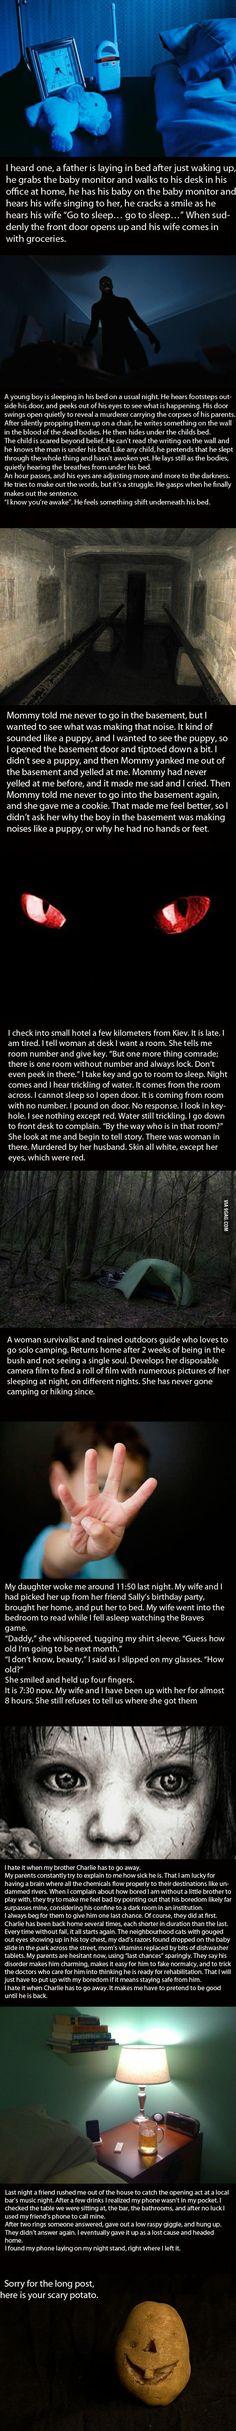 Creepy.